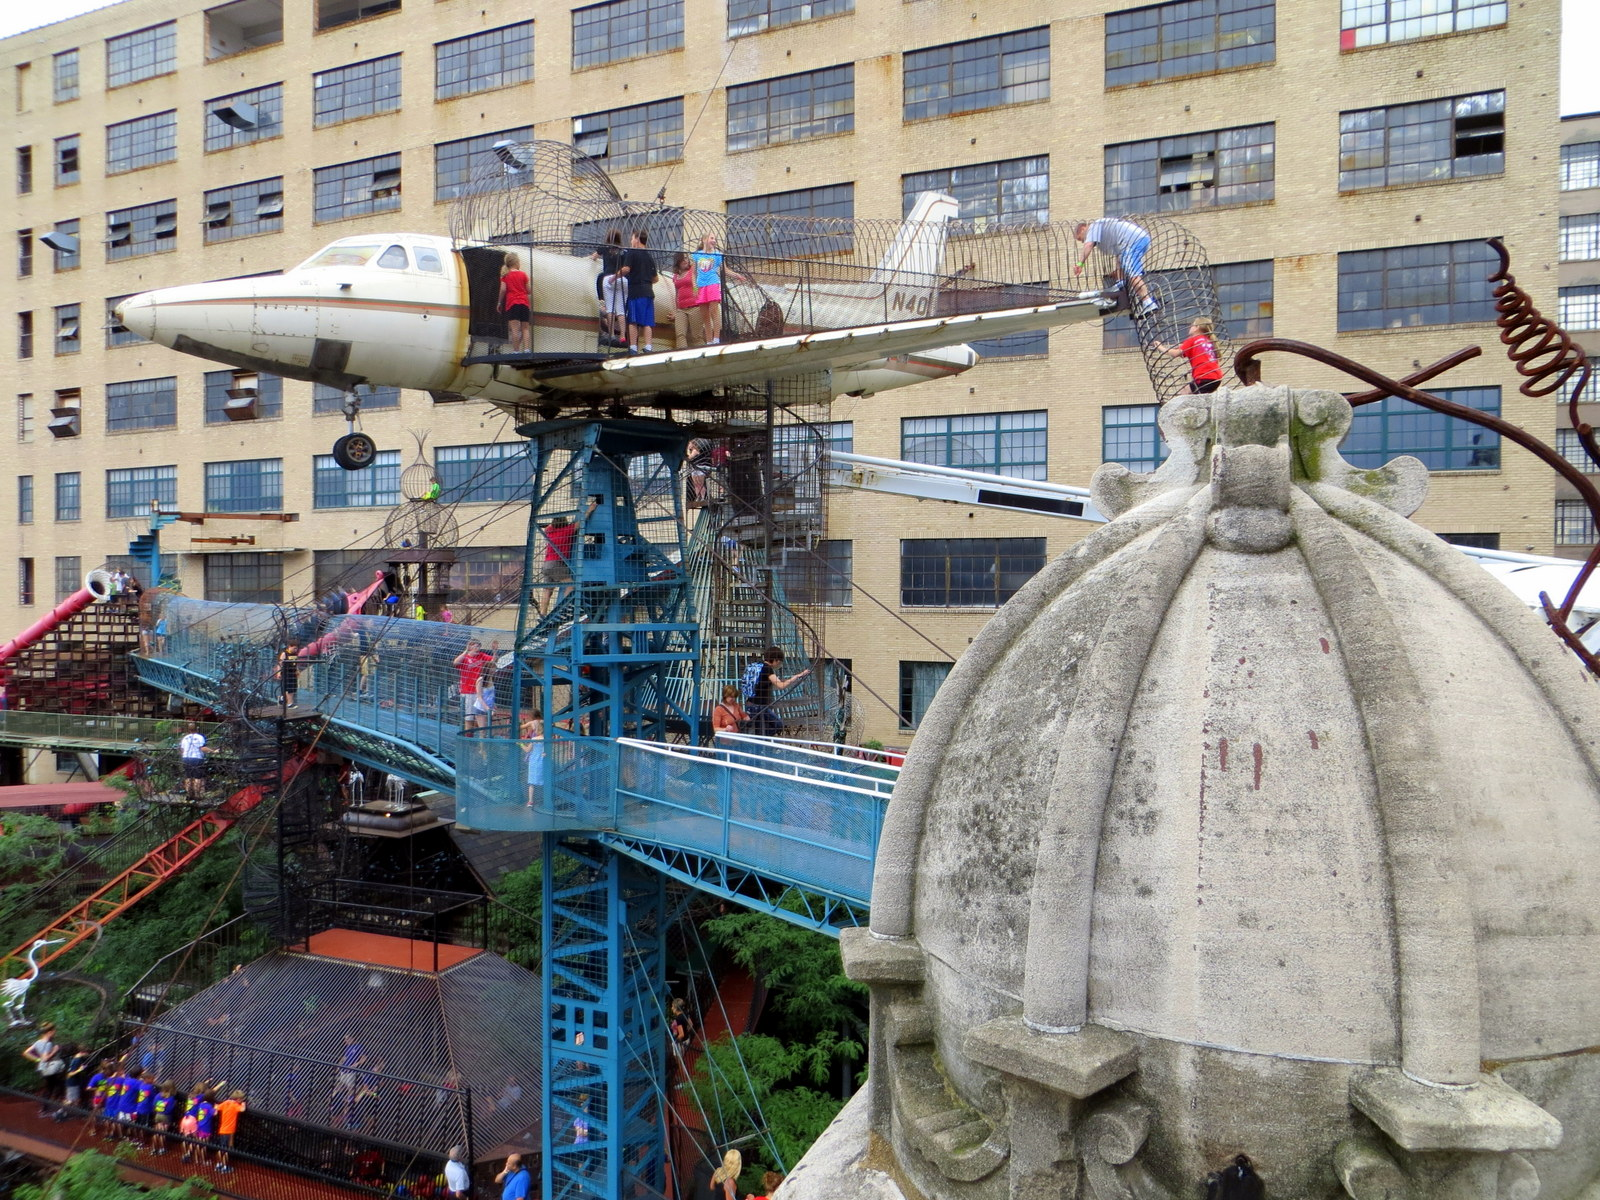 36333e1abf30 OTIS (Odd Things I ve Seen)  Playground of Terror  The City Museum